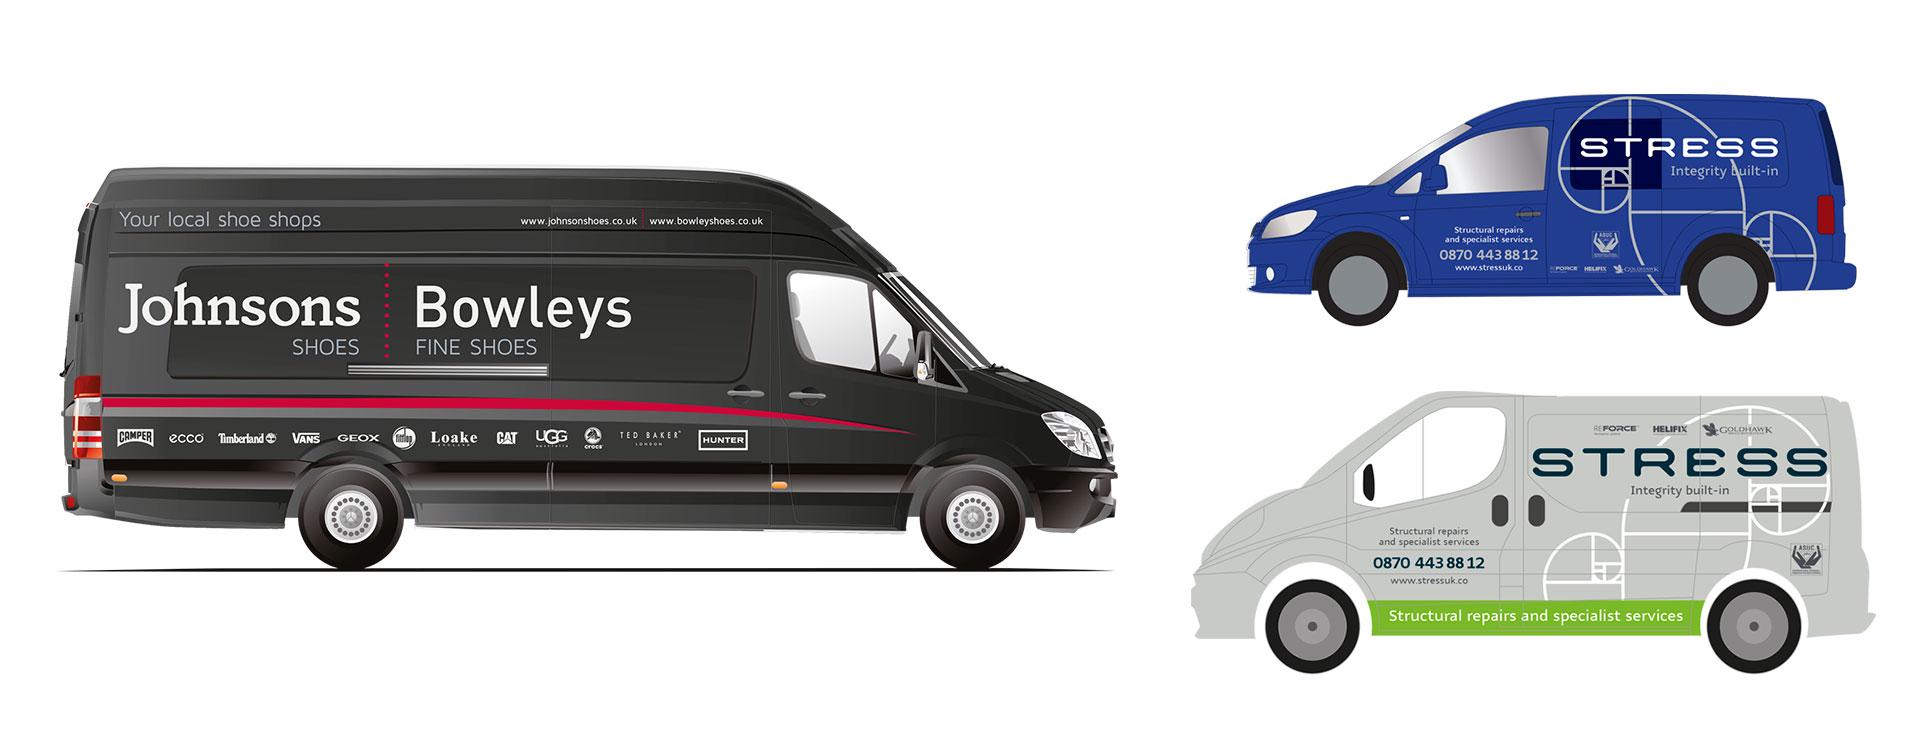 Vehicle livery and vinyl van graphics